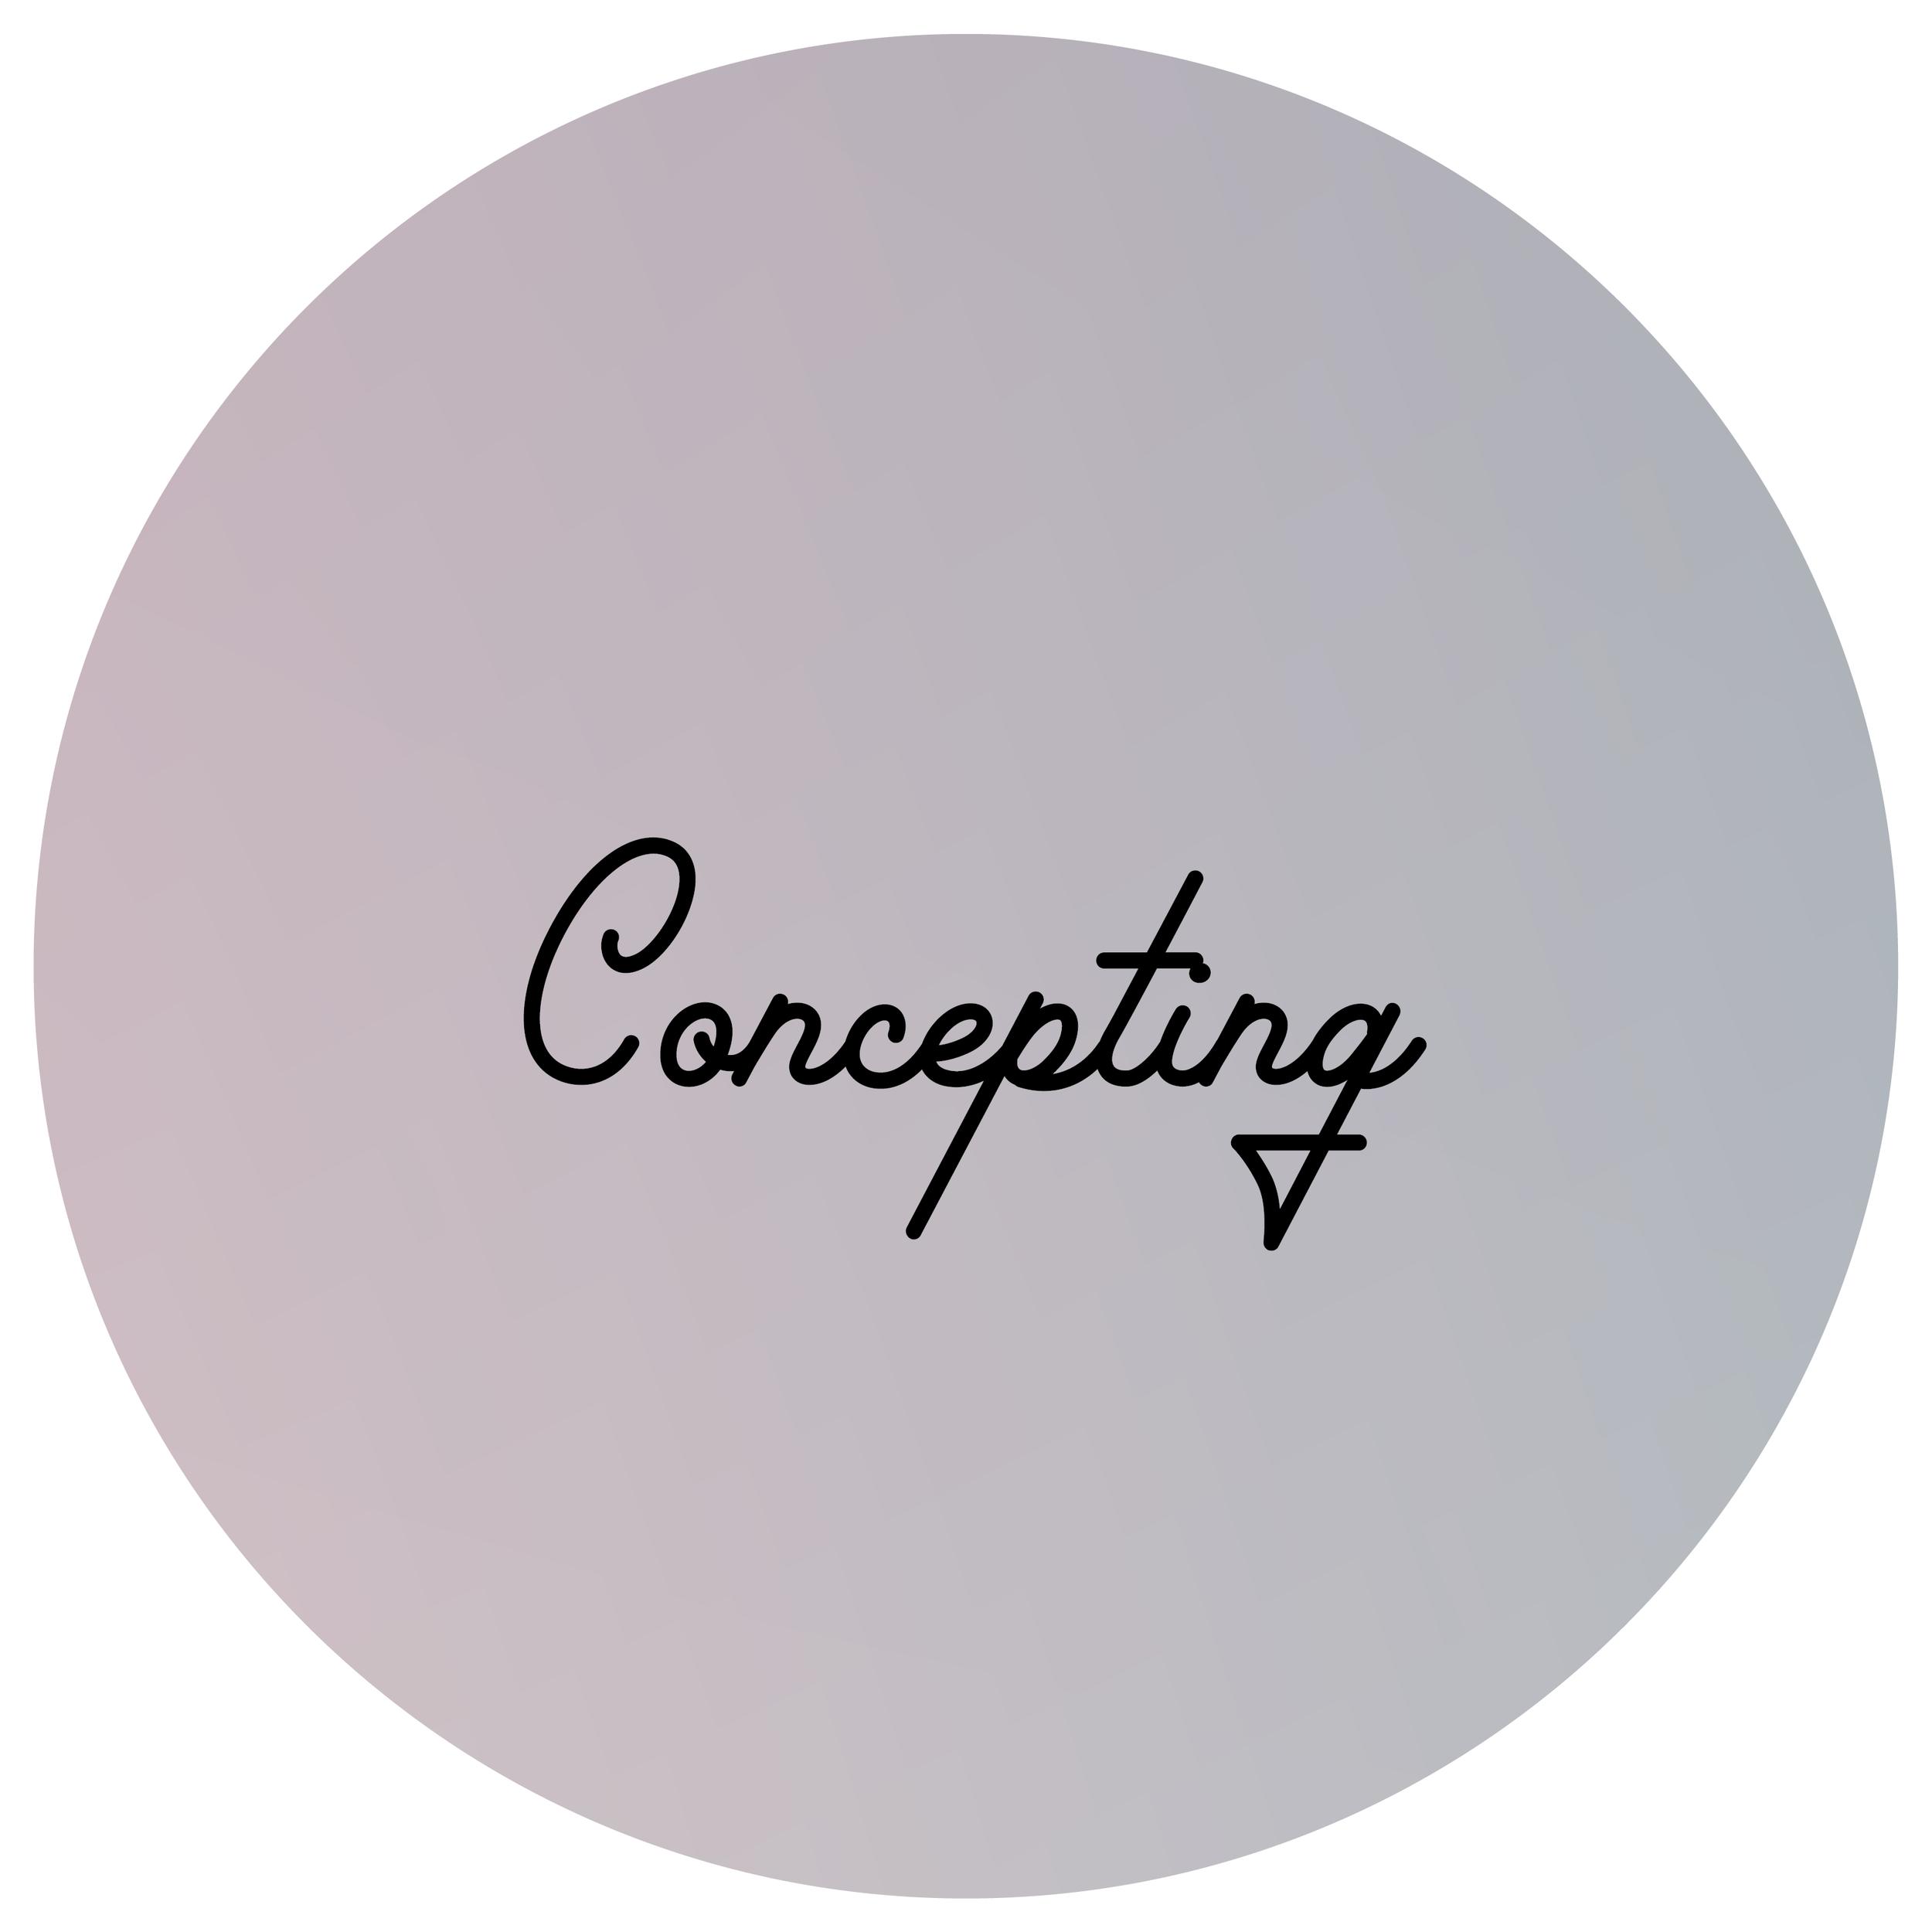 Process_circles-03.png